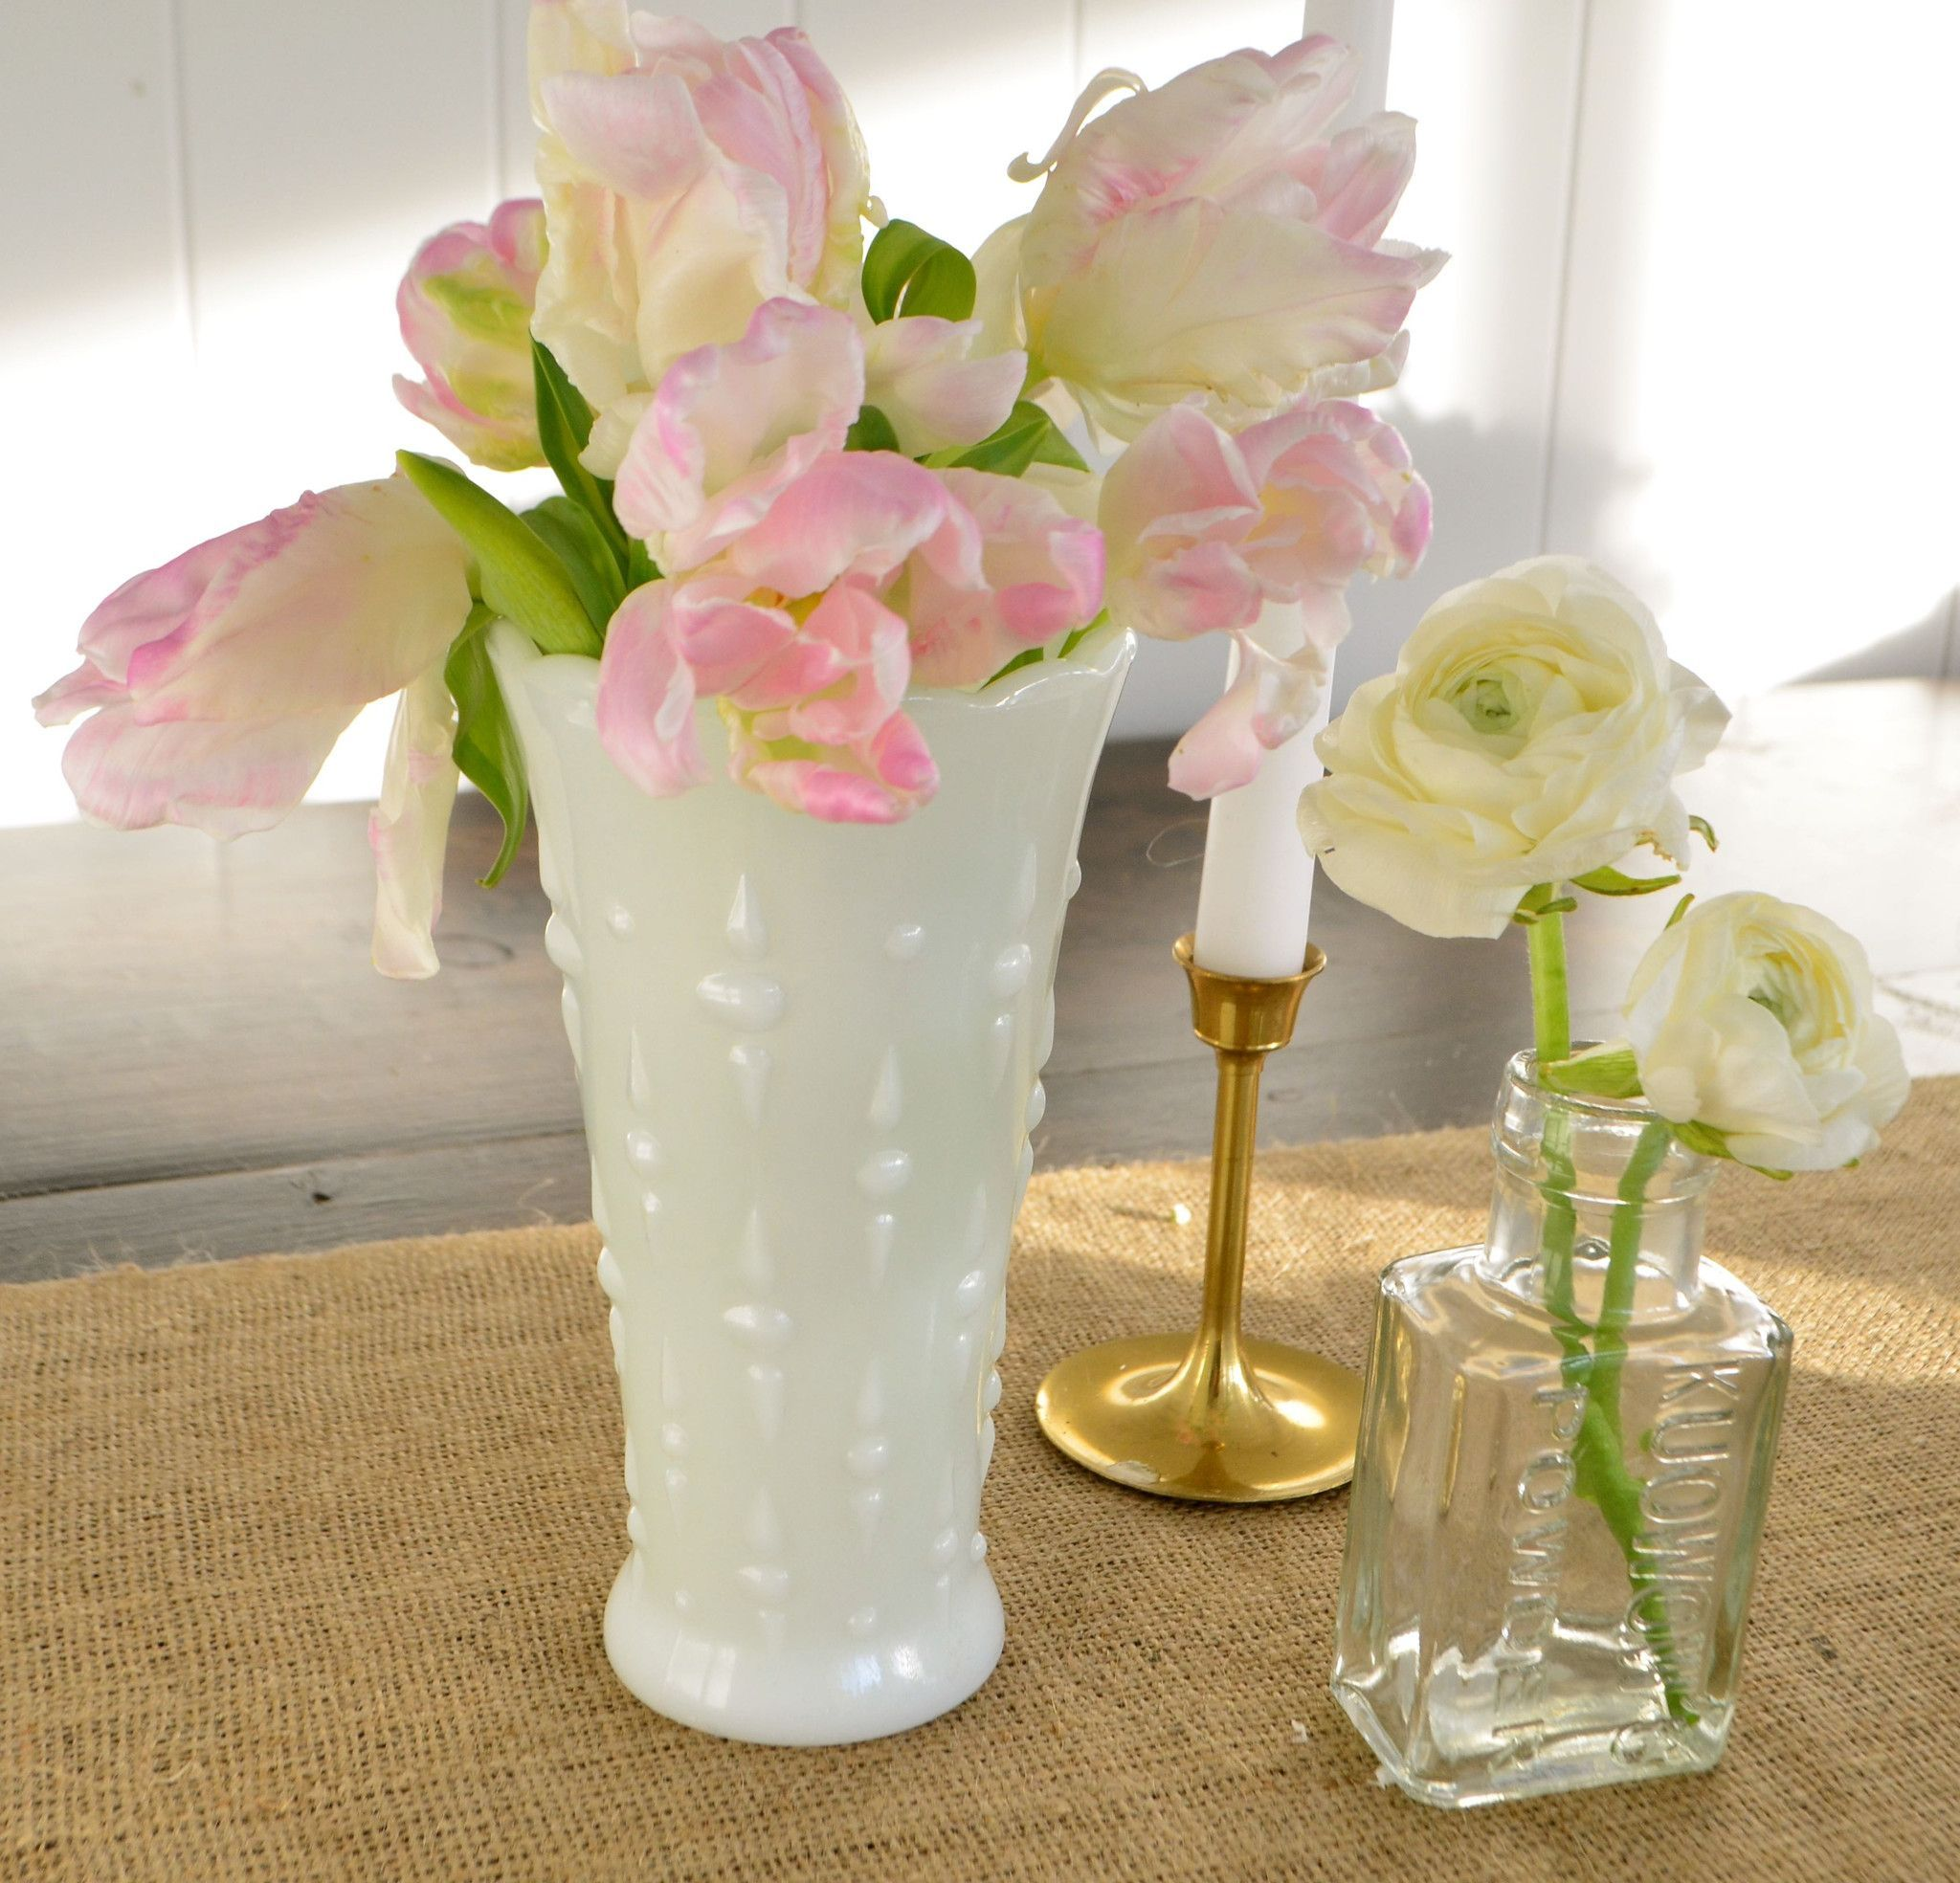 Vintage White Milk Glass Tall Textured Vase